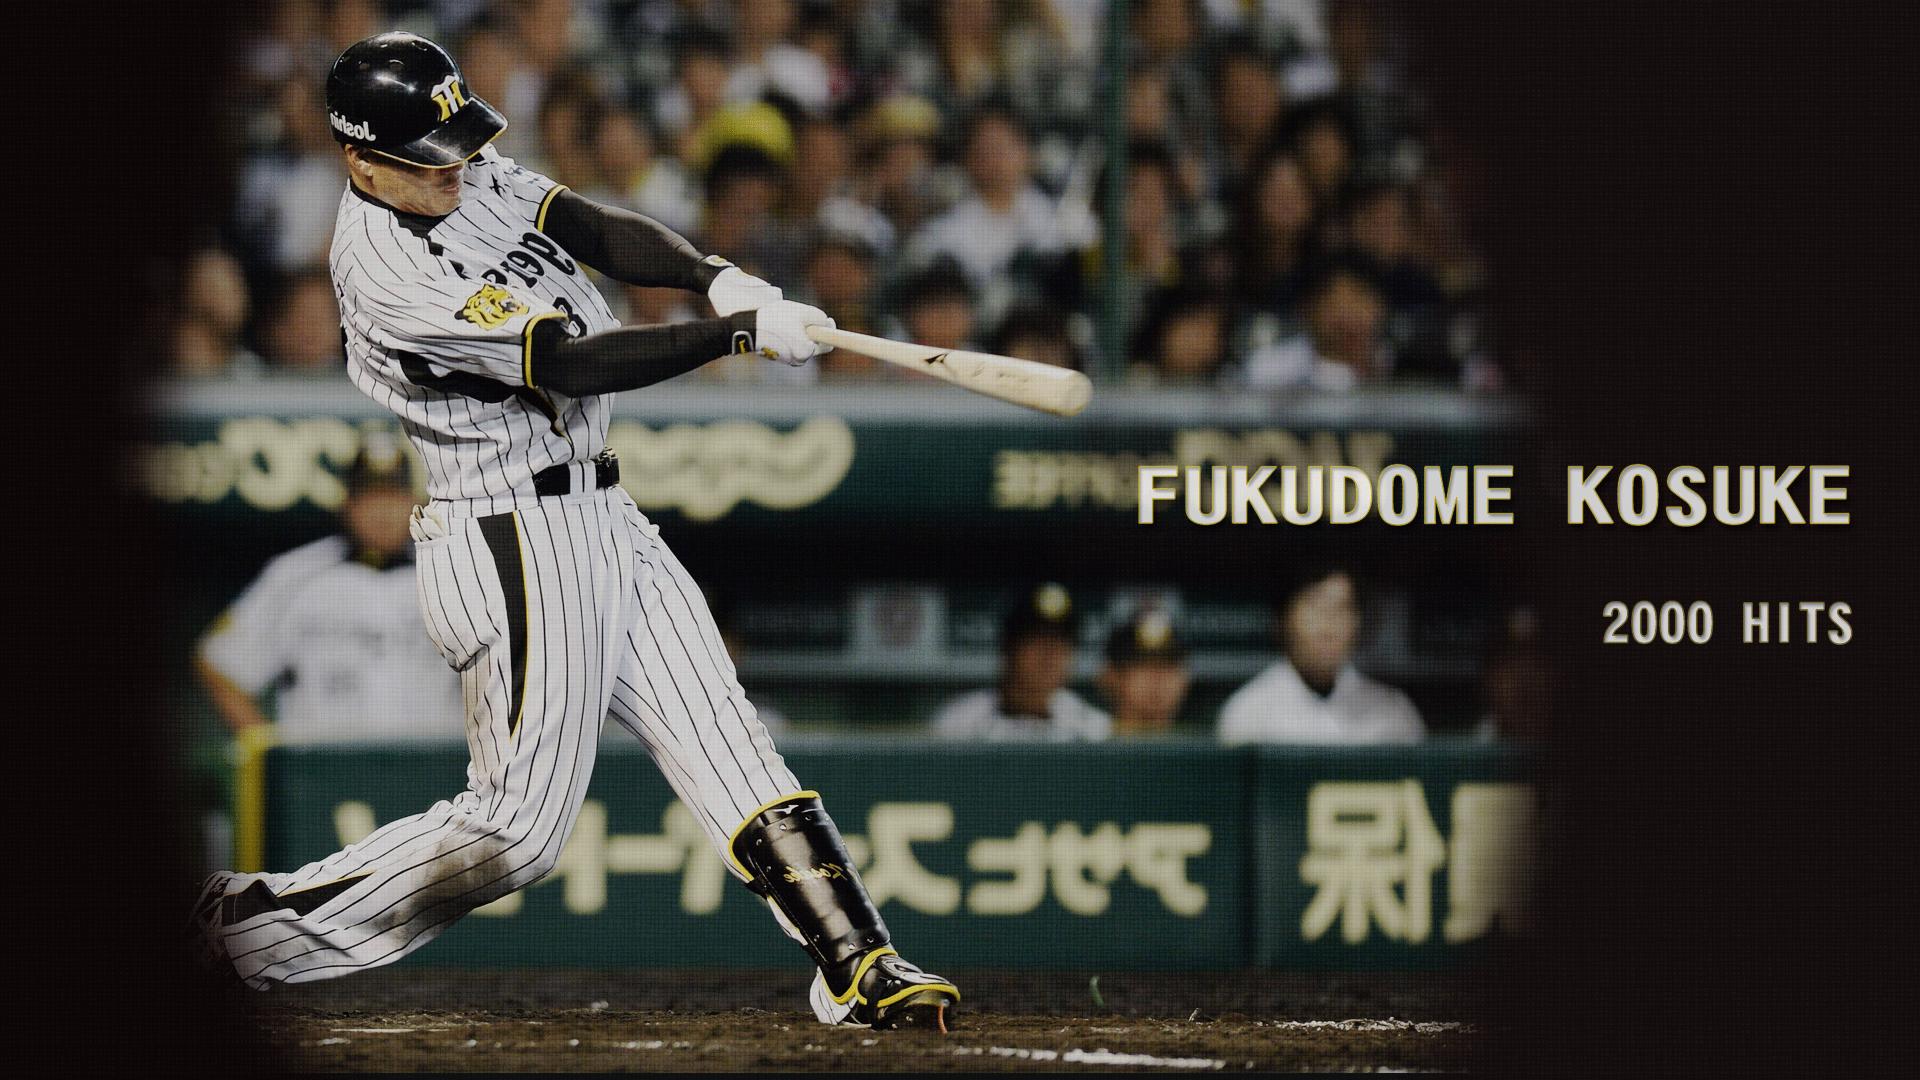 fukudome kosuke hanshin tigers wallpaper